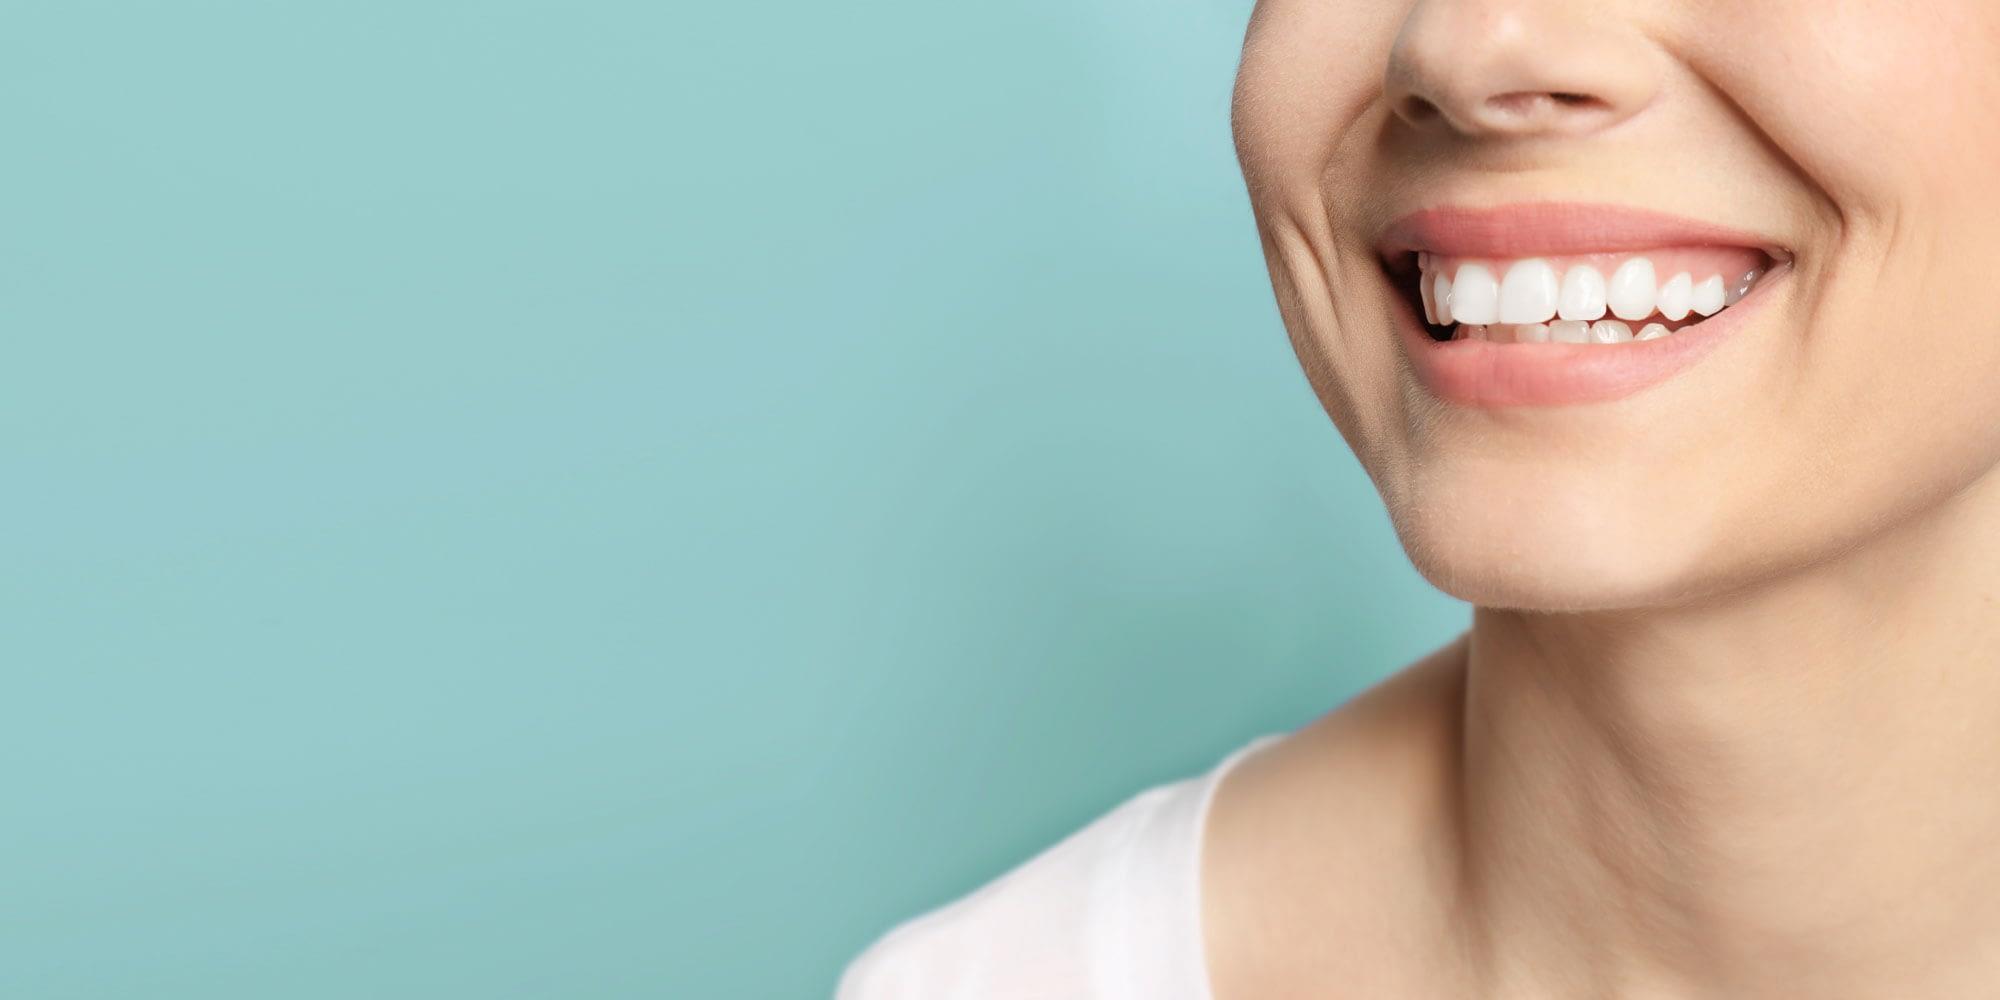 teeth whitening patient smiling Brownstown, MI